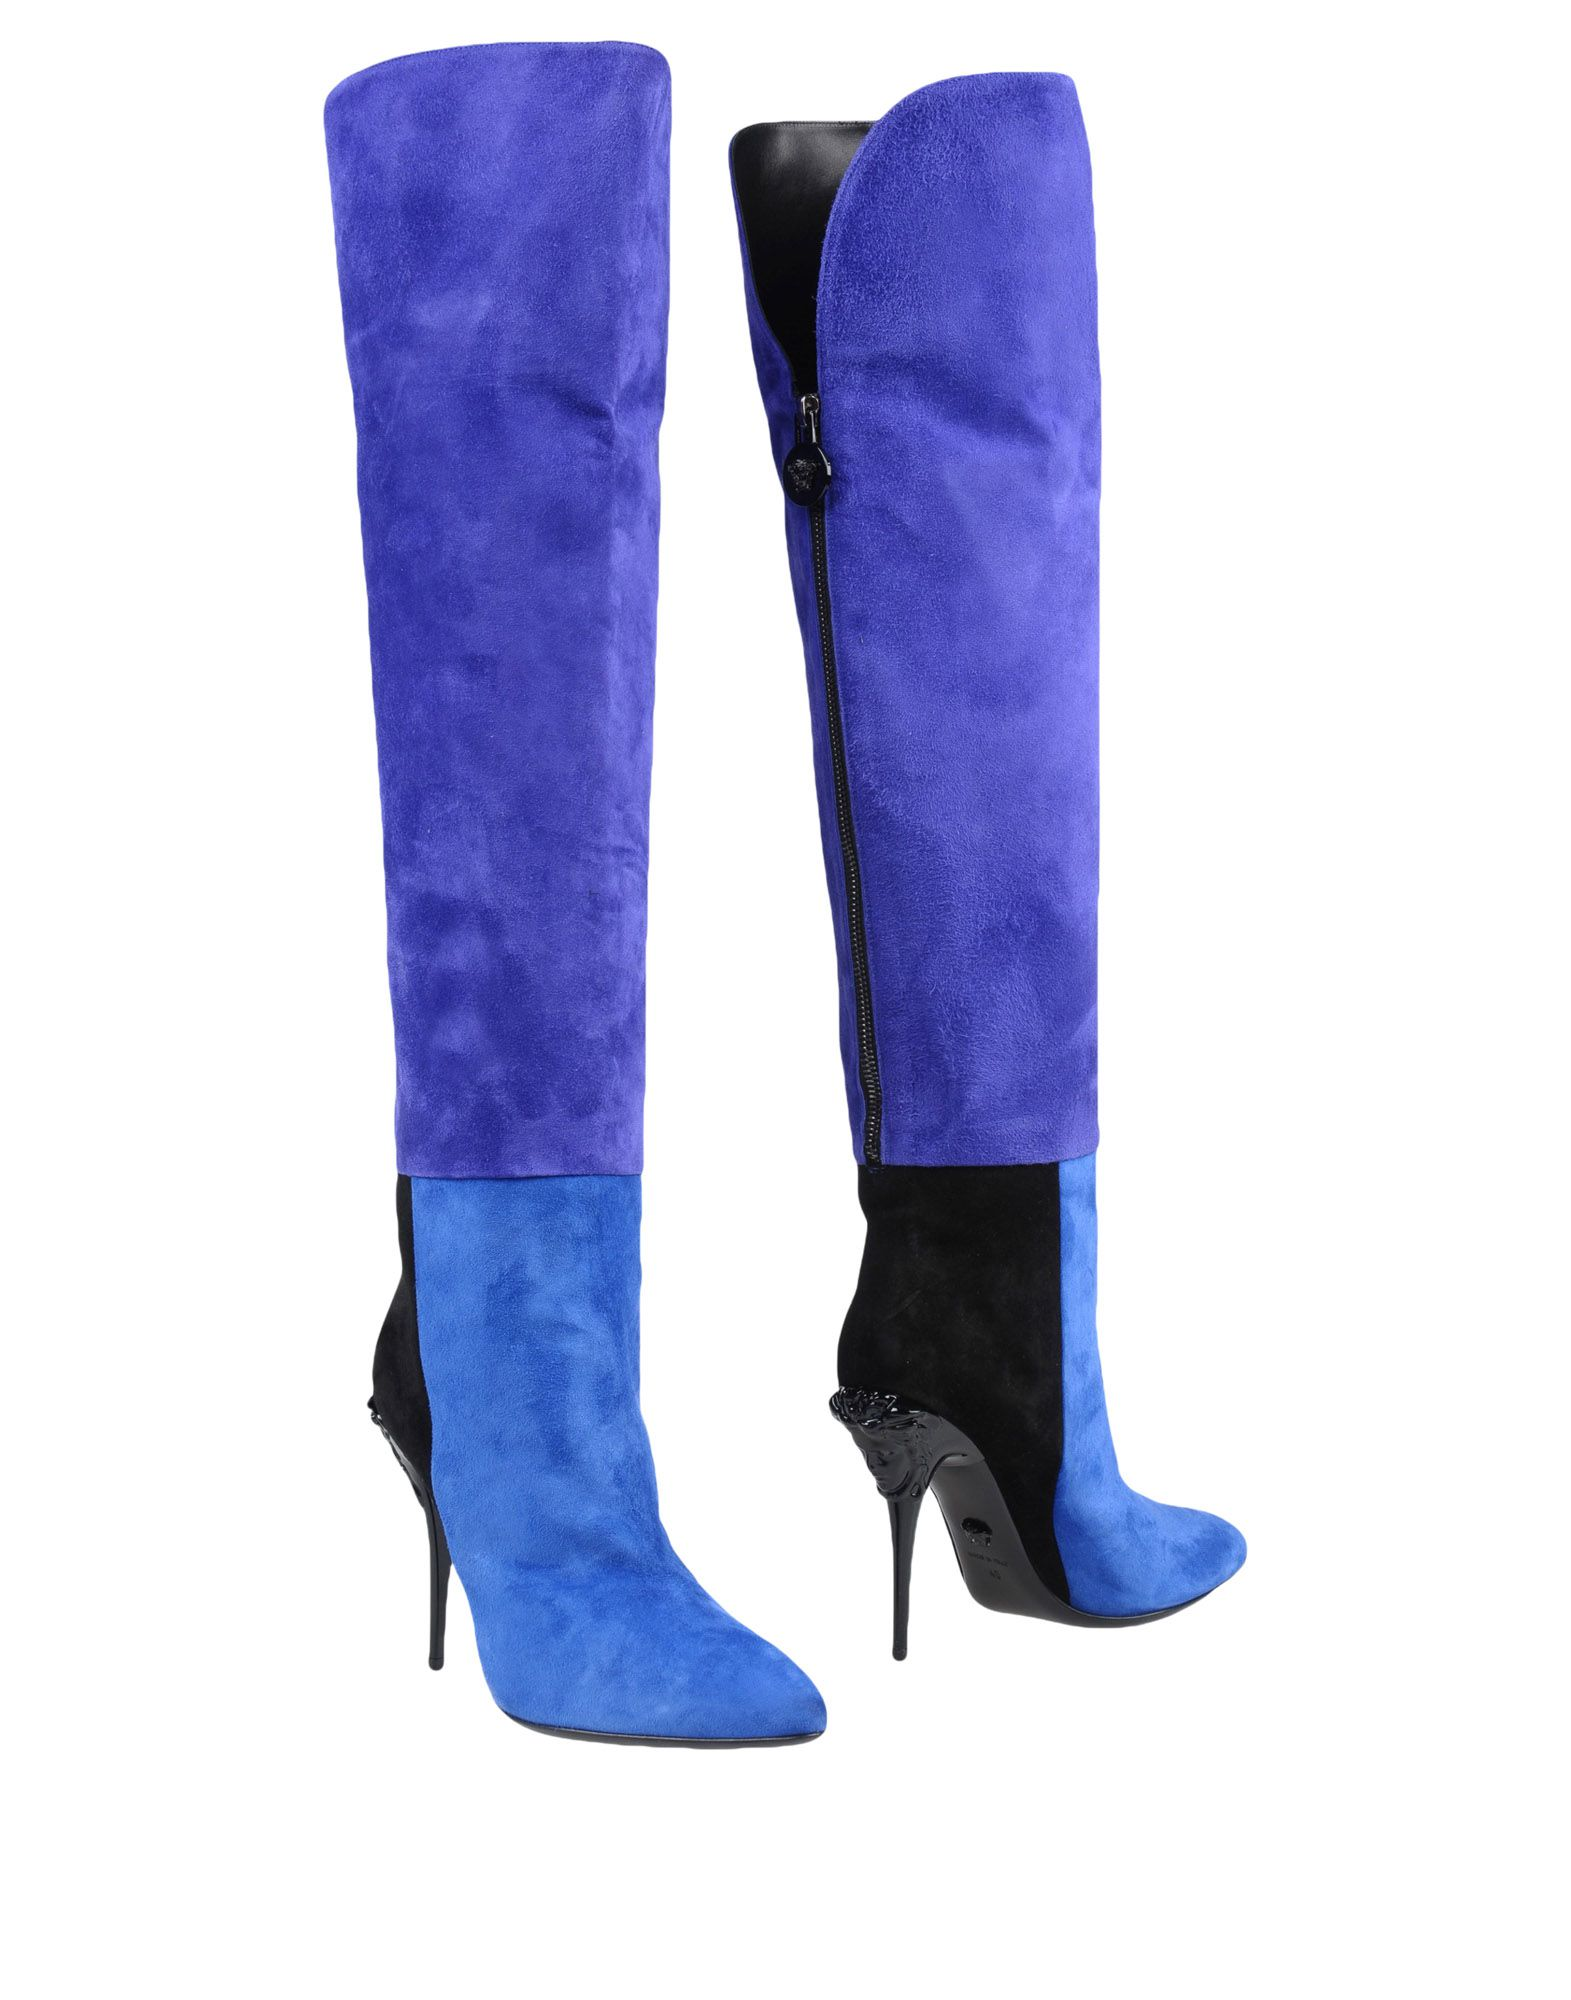 Stivali Versace Donna - Acquista online su